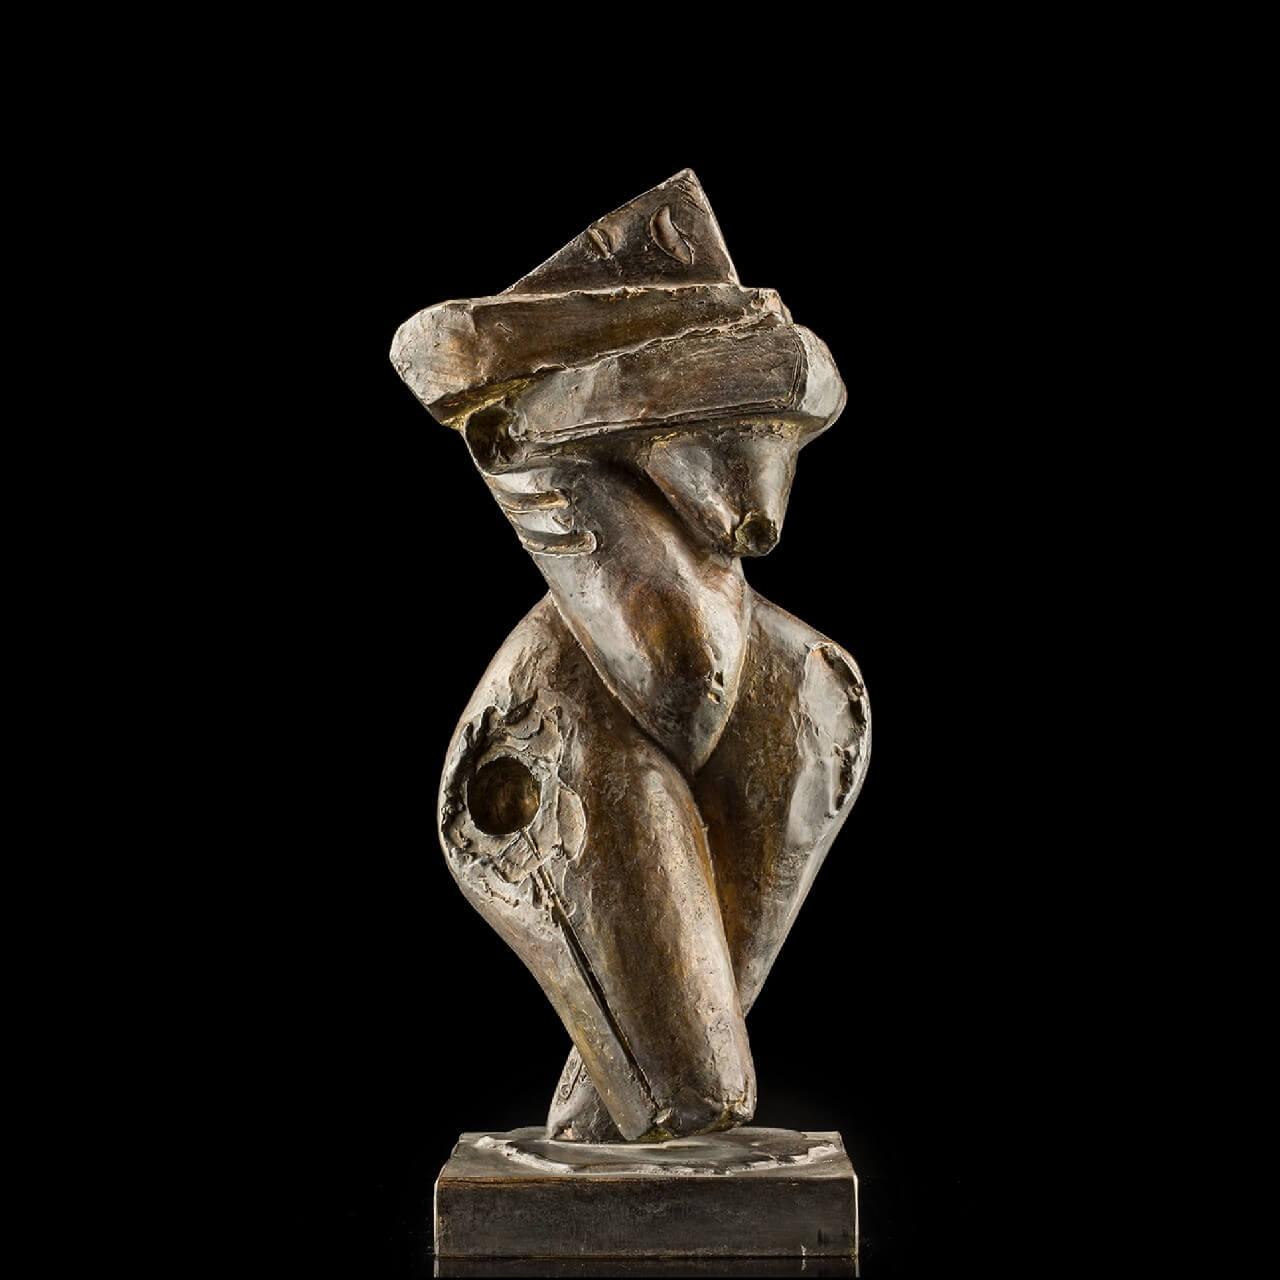 mario pavesi italian sculptur painter bronze maternity female figure